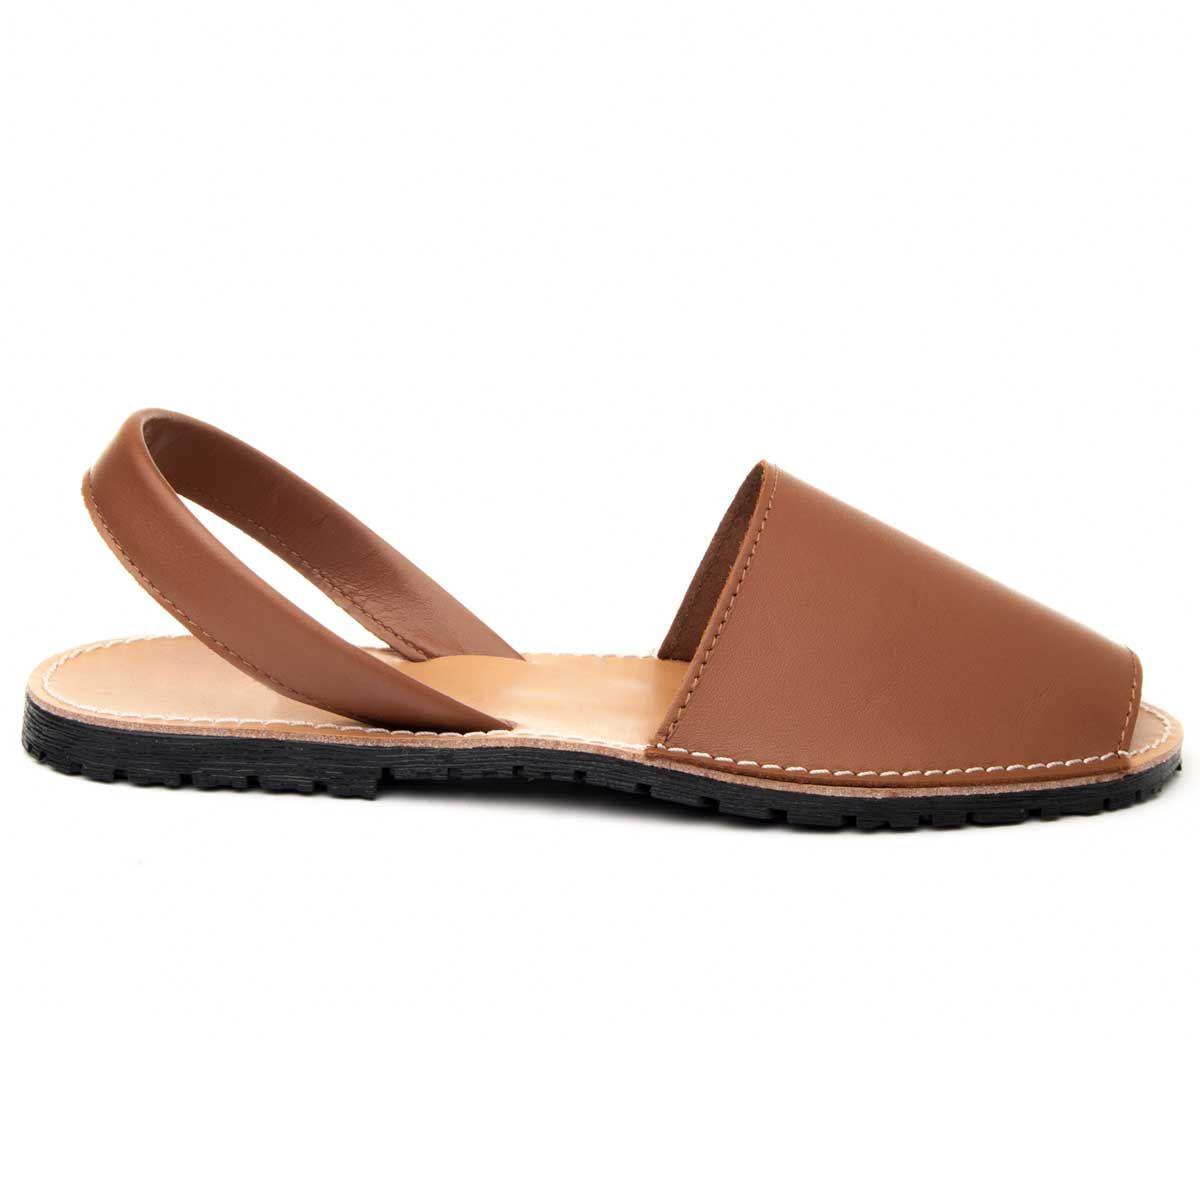 Purapiel Slingback Flat Sandal in Camel